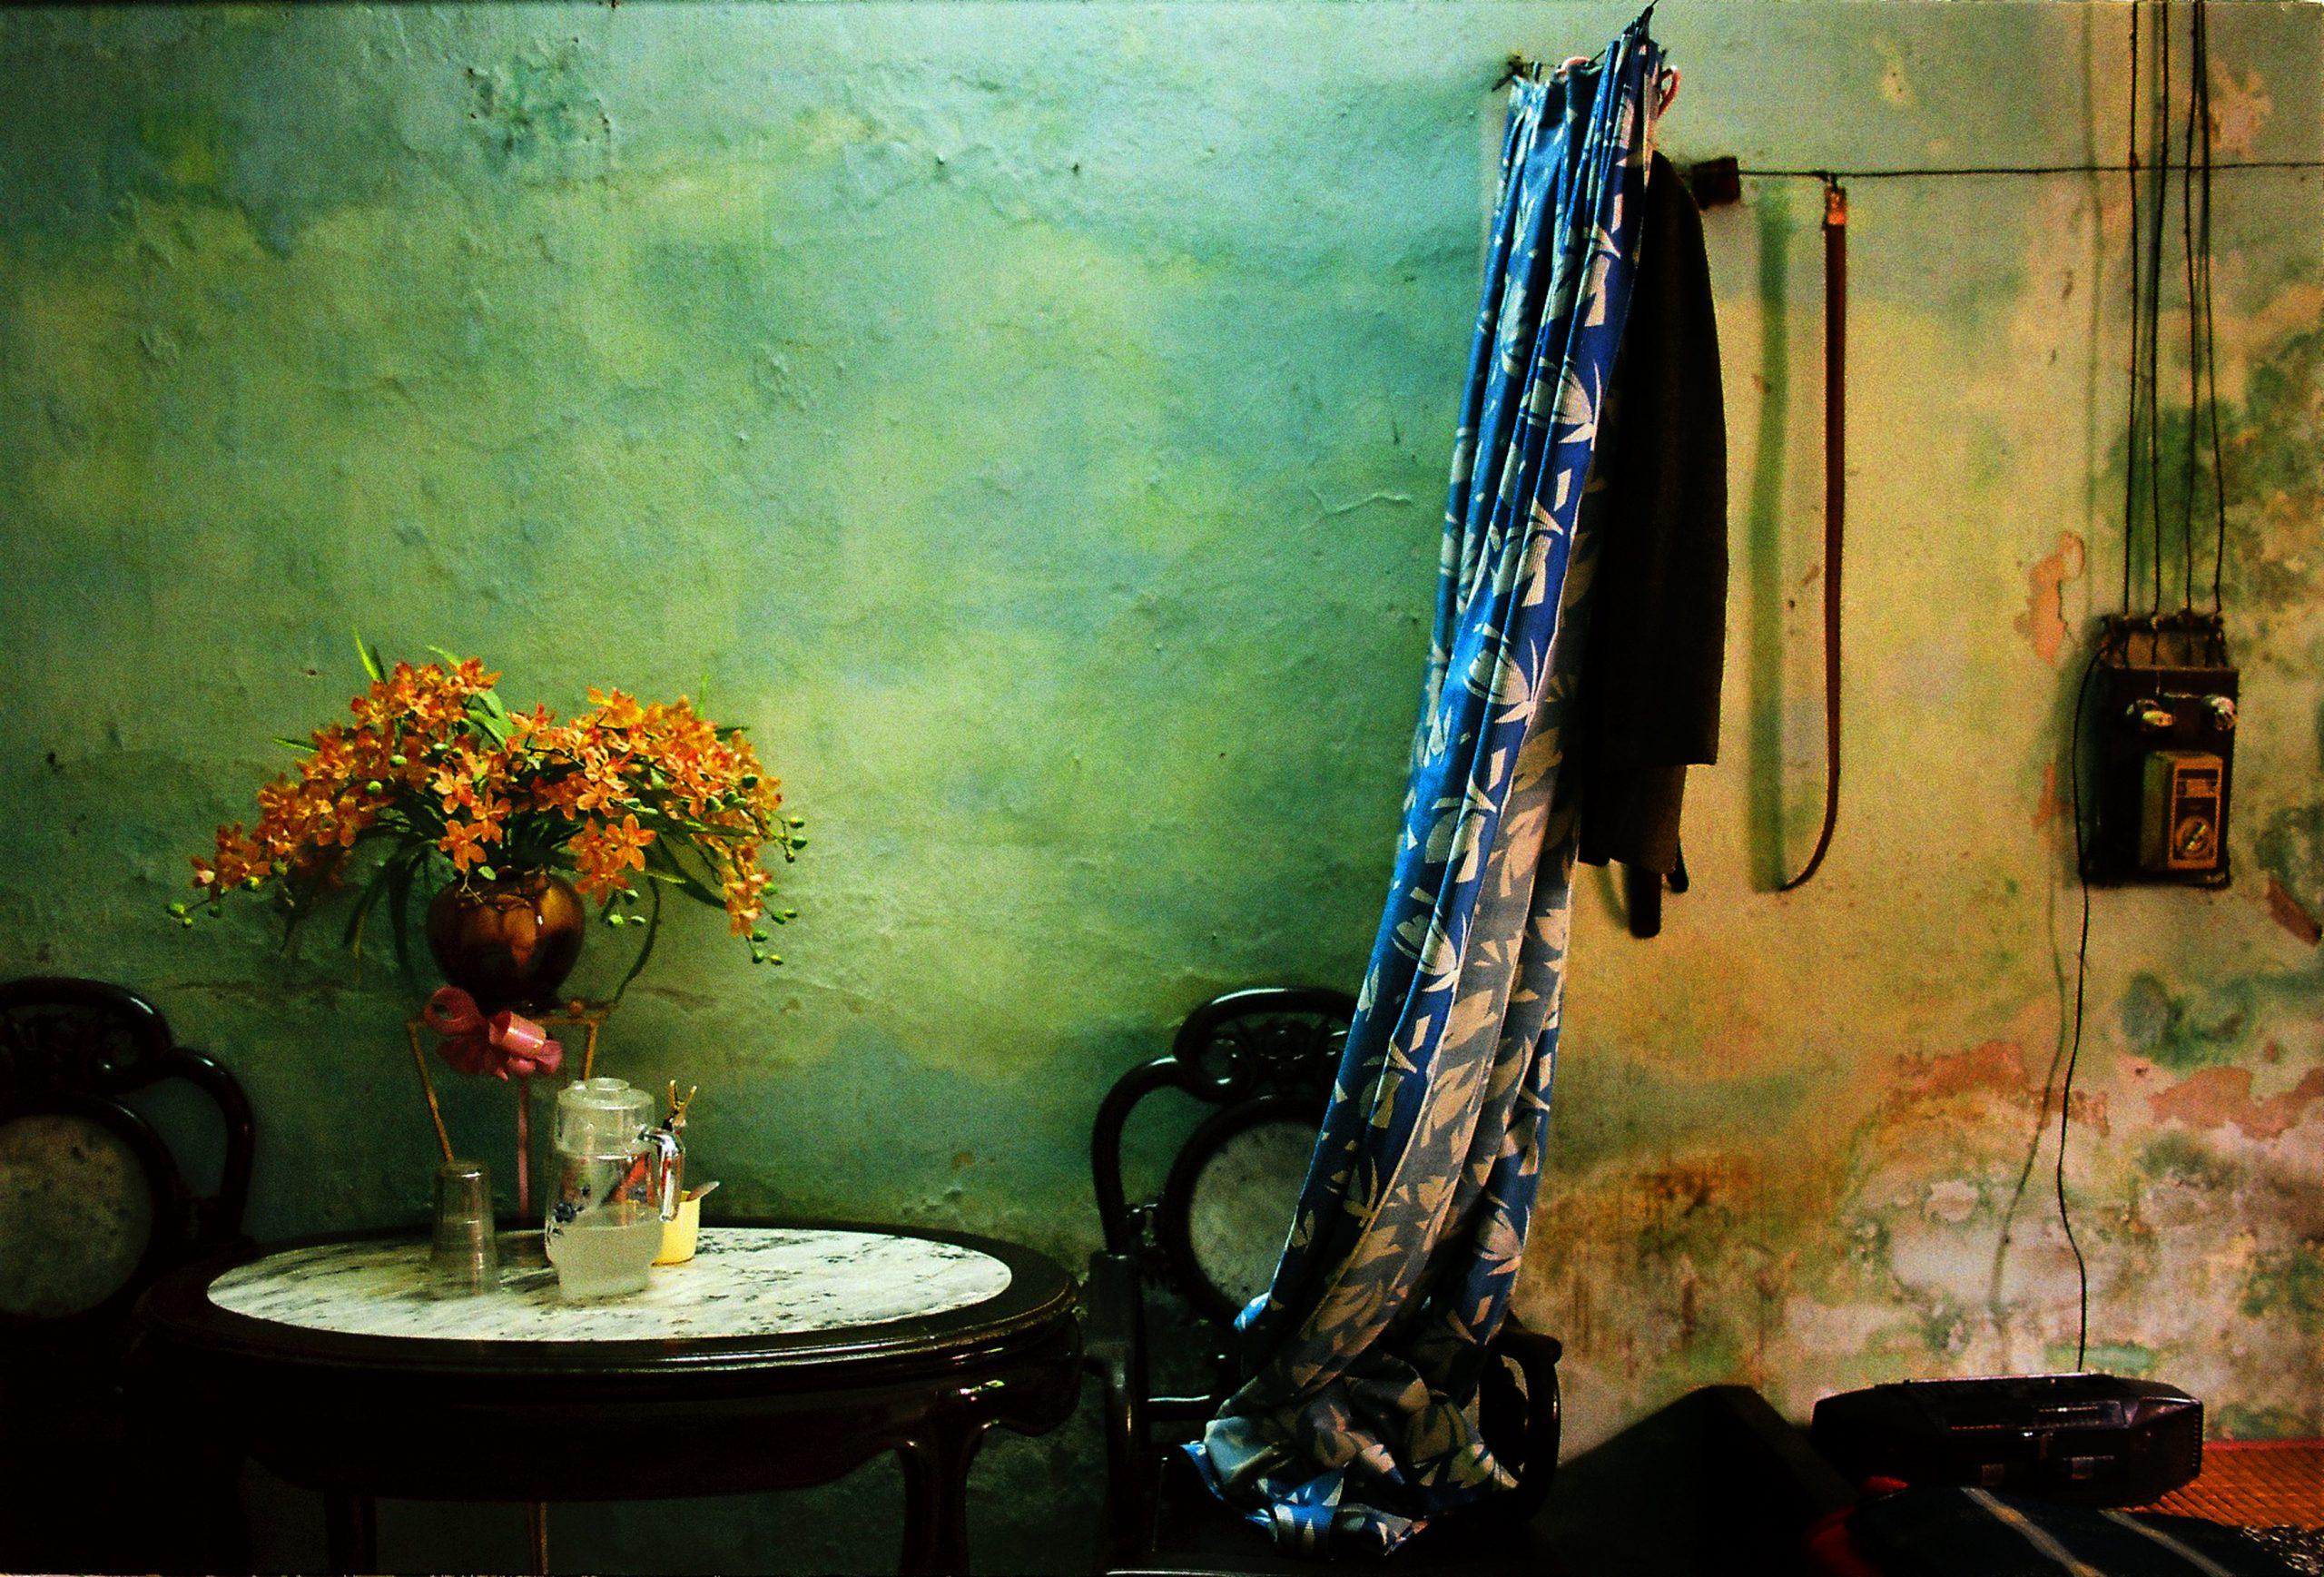 Color photo by Maika Elan from Inside Hanoi.